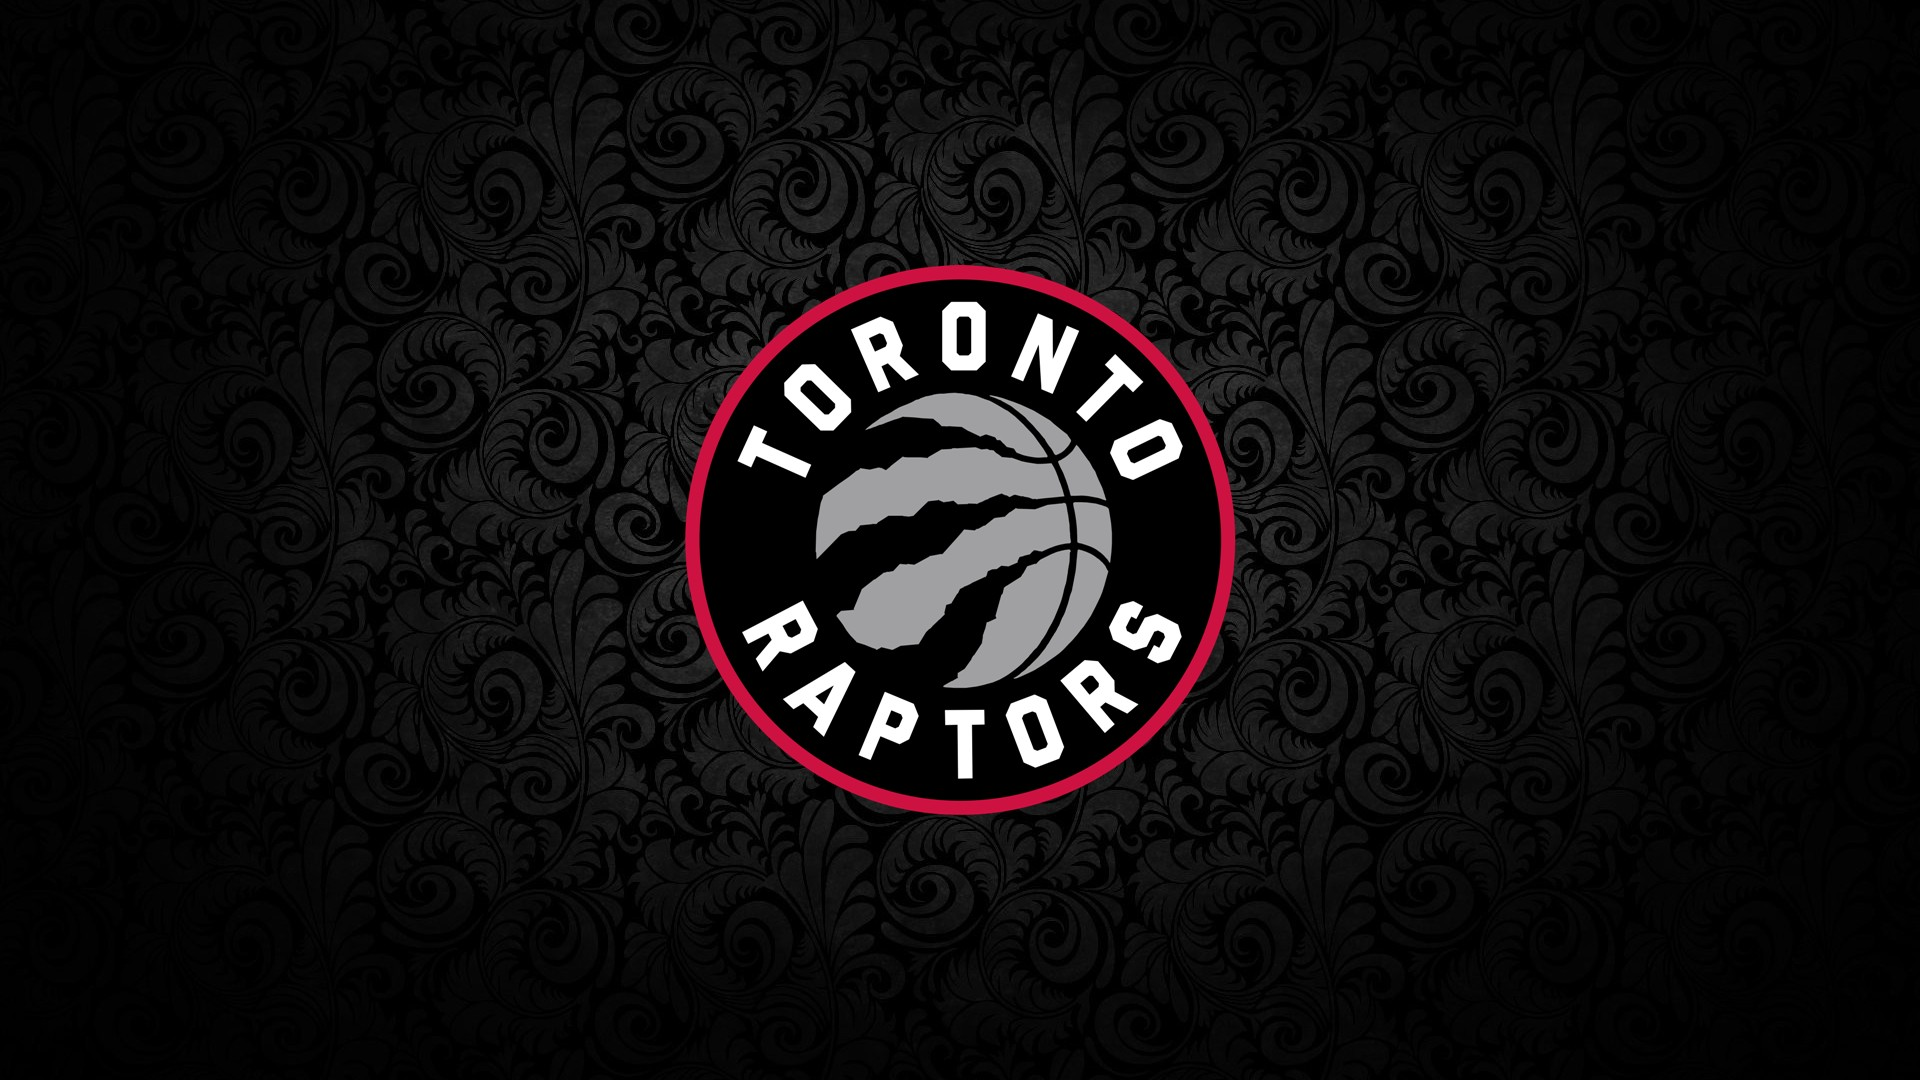 Basketball Toronto Desktop Wallpaper 2019 Basketball Wallpaper 1920x1080